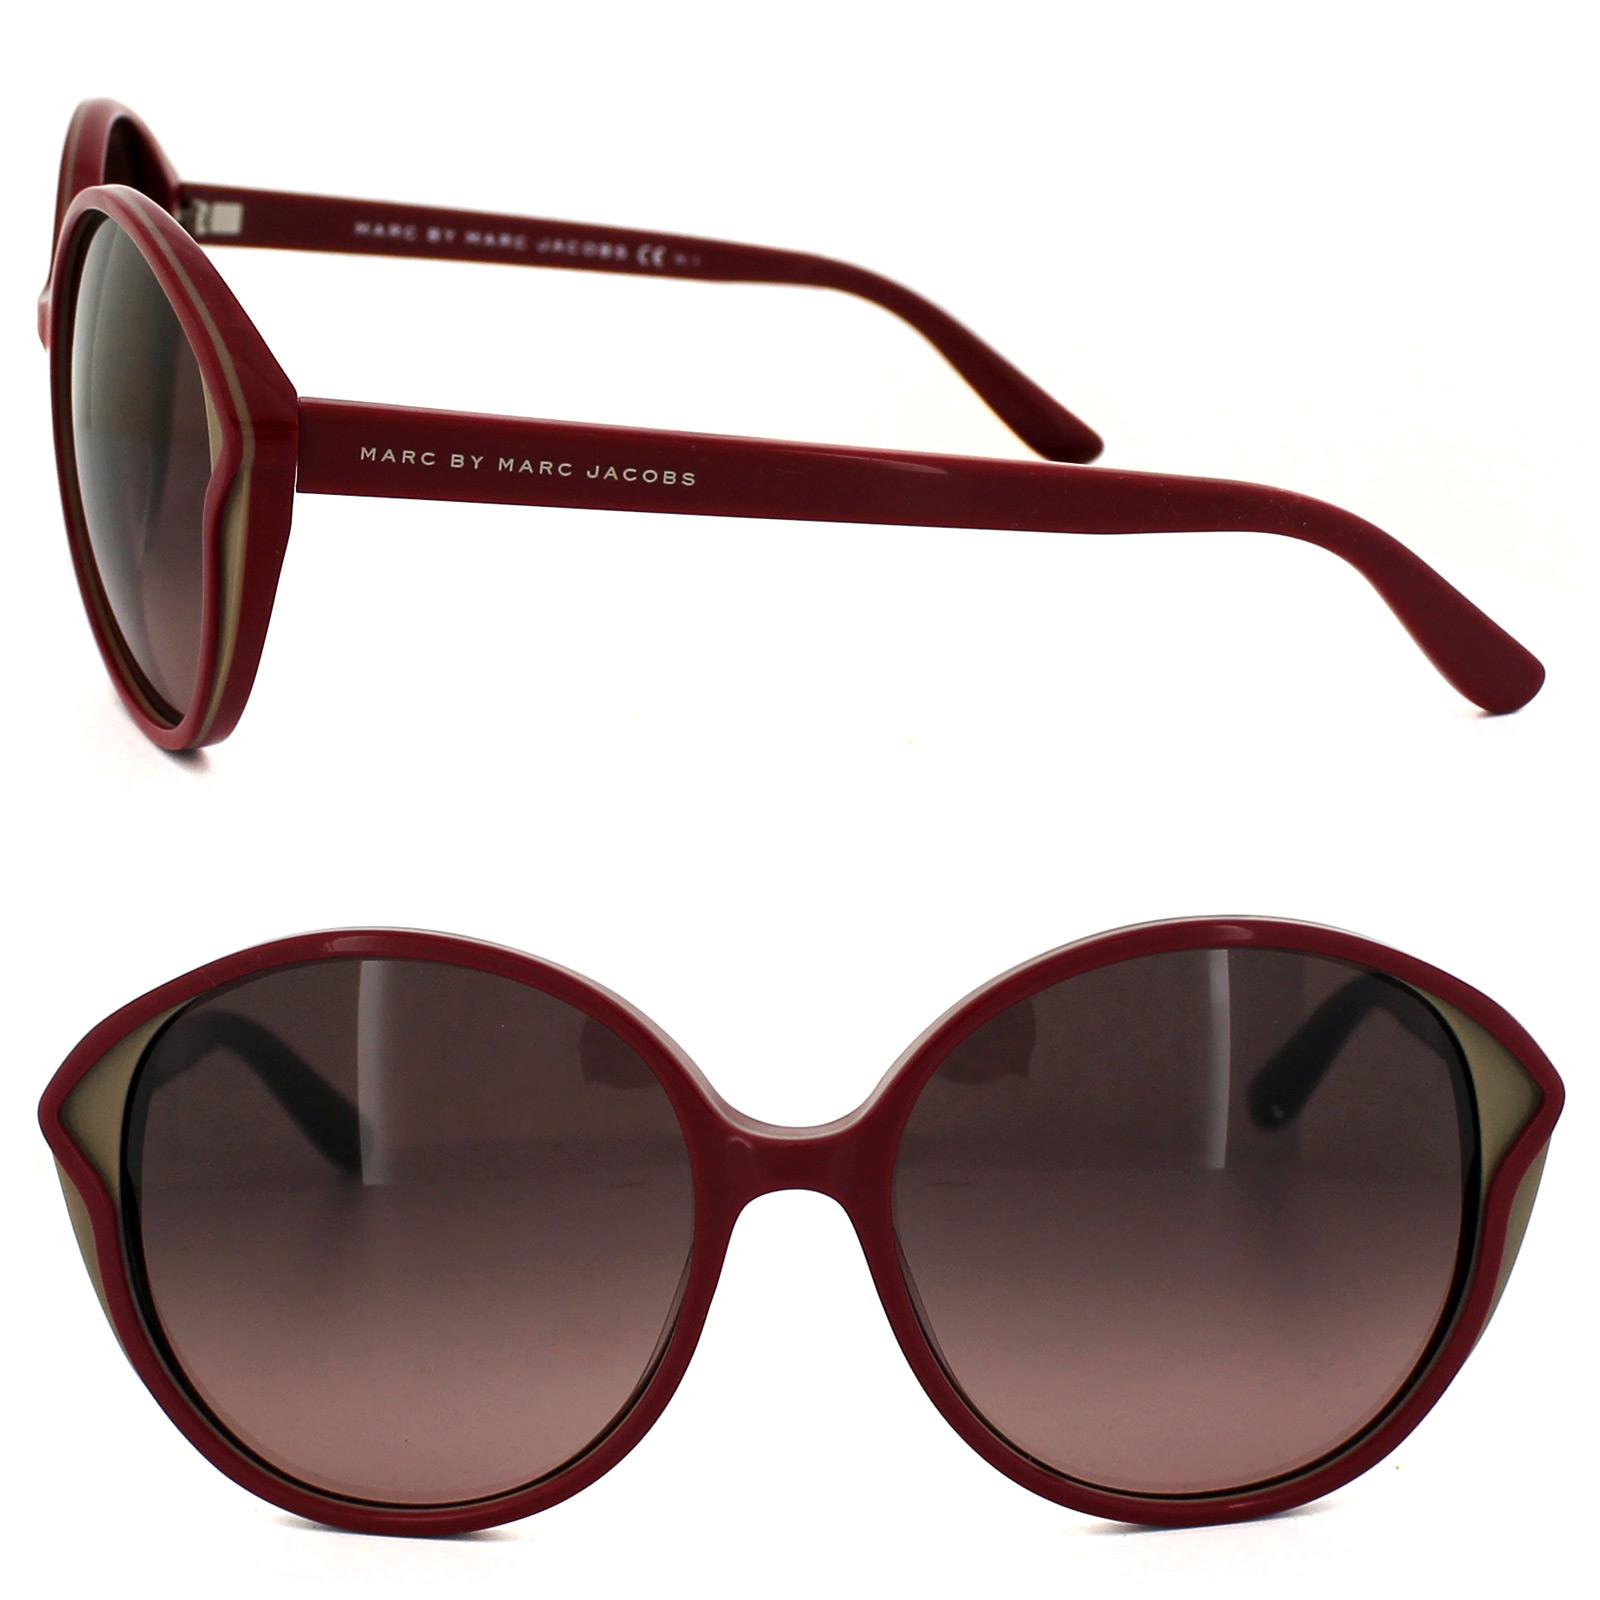 marc jacobs sonnenbrille 381 fke dz rosa cyclamen caramel mauve verlauf ebay. Black Bedroom Furniture Sets. Home Design Ideas